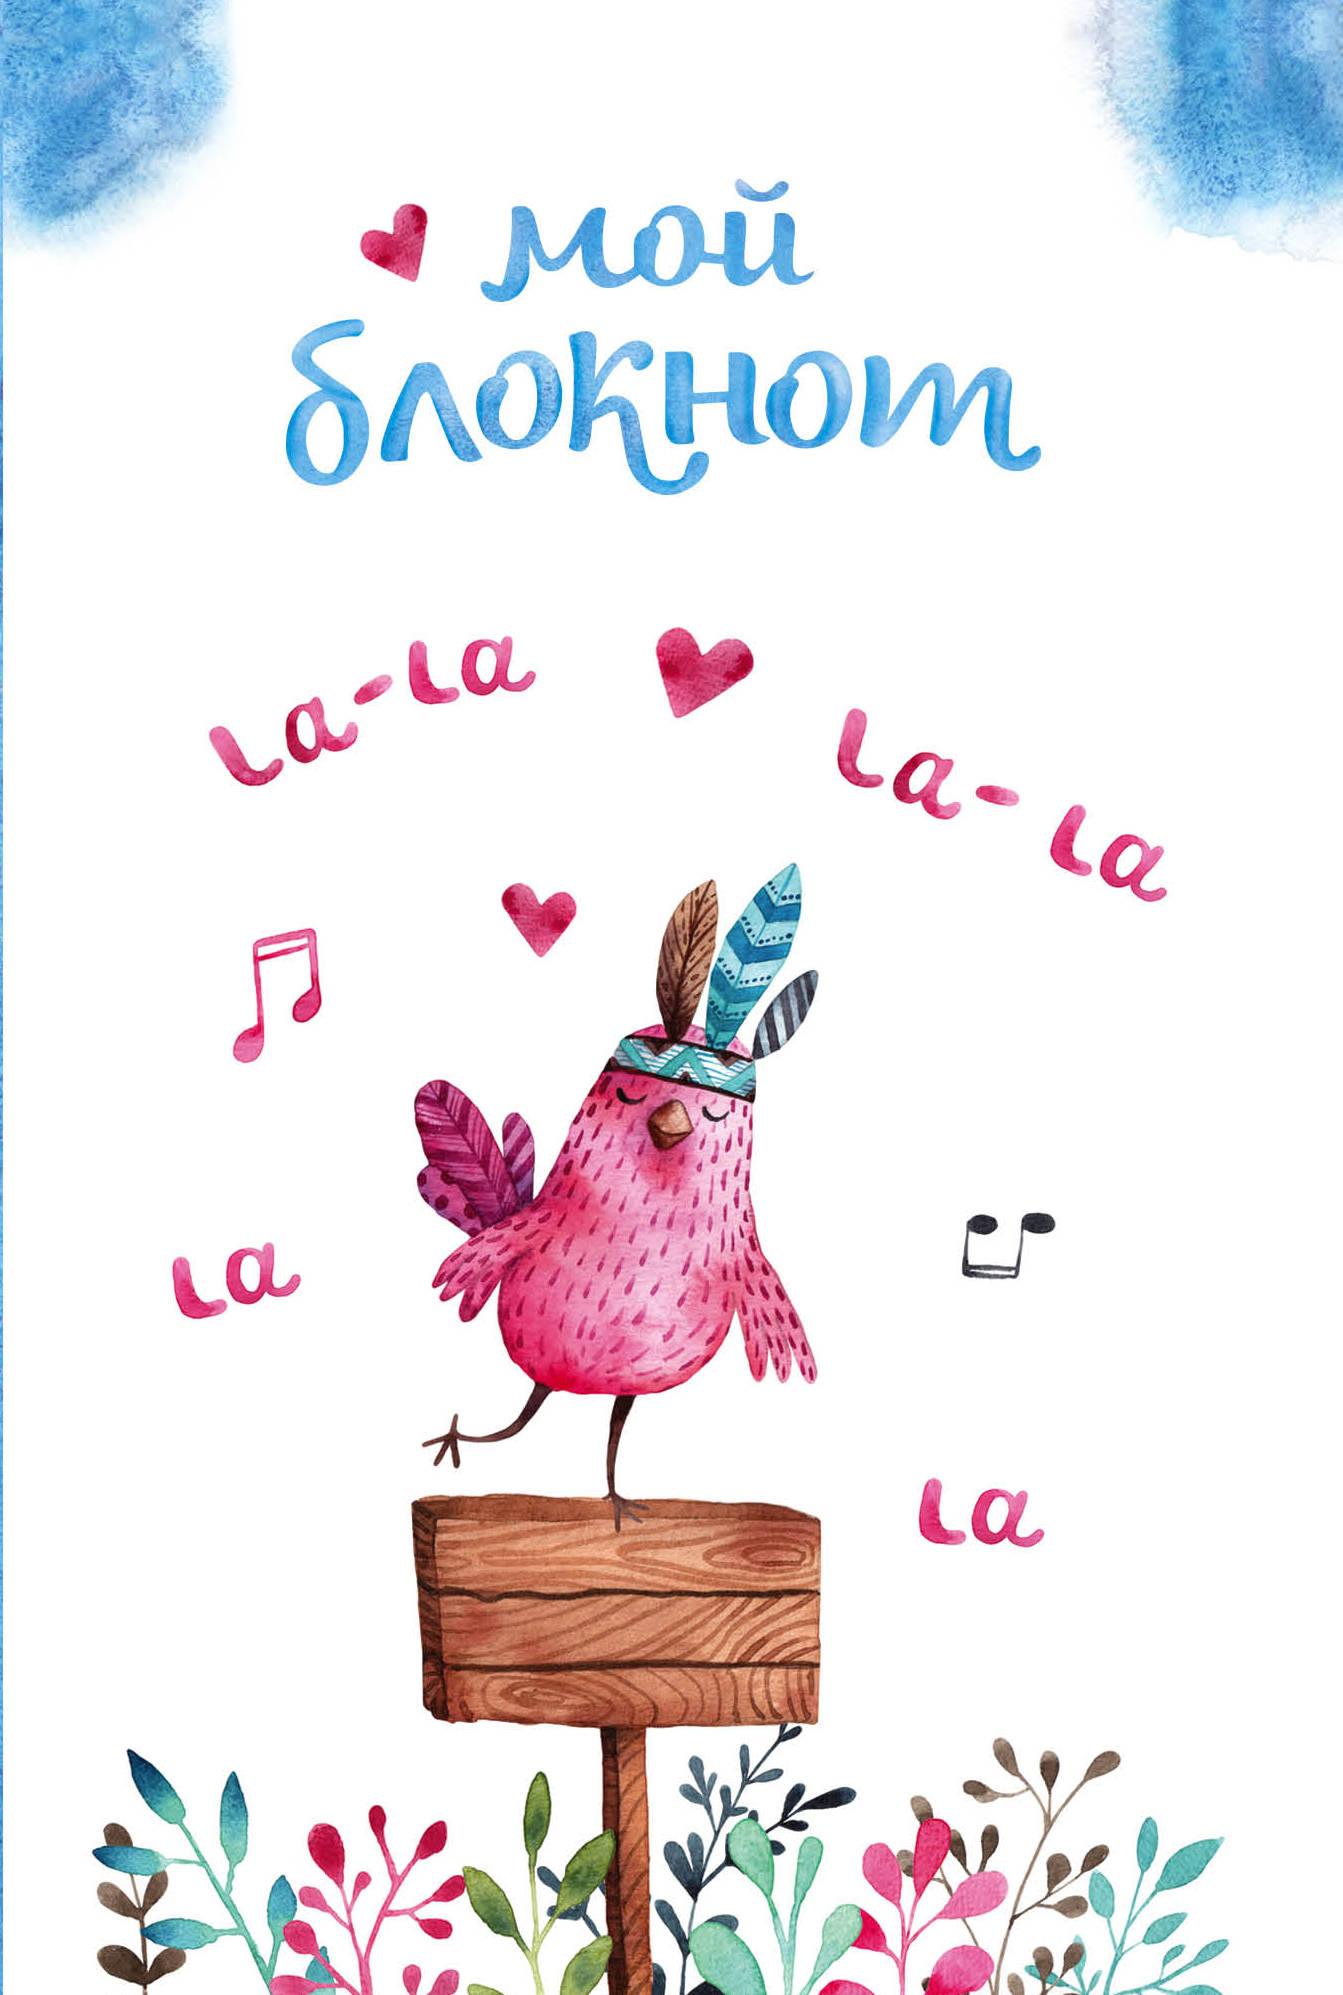 М. А. Ступак Мой блокнот. Певчие птички от @mashamashastu (голубой) м а ступак певчие птички от mashamashastu мой блокнот зеленый